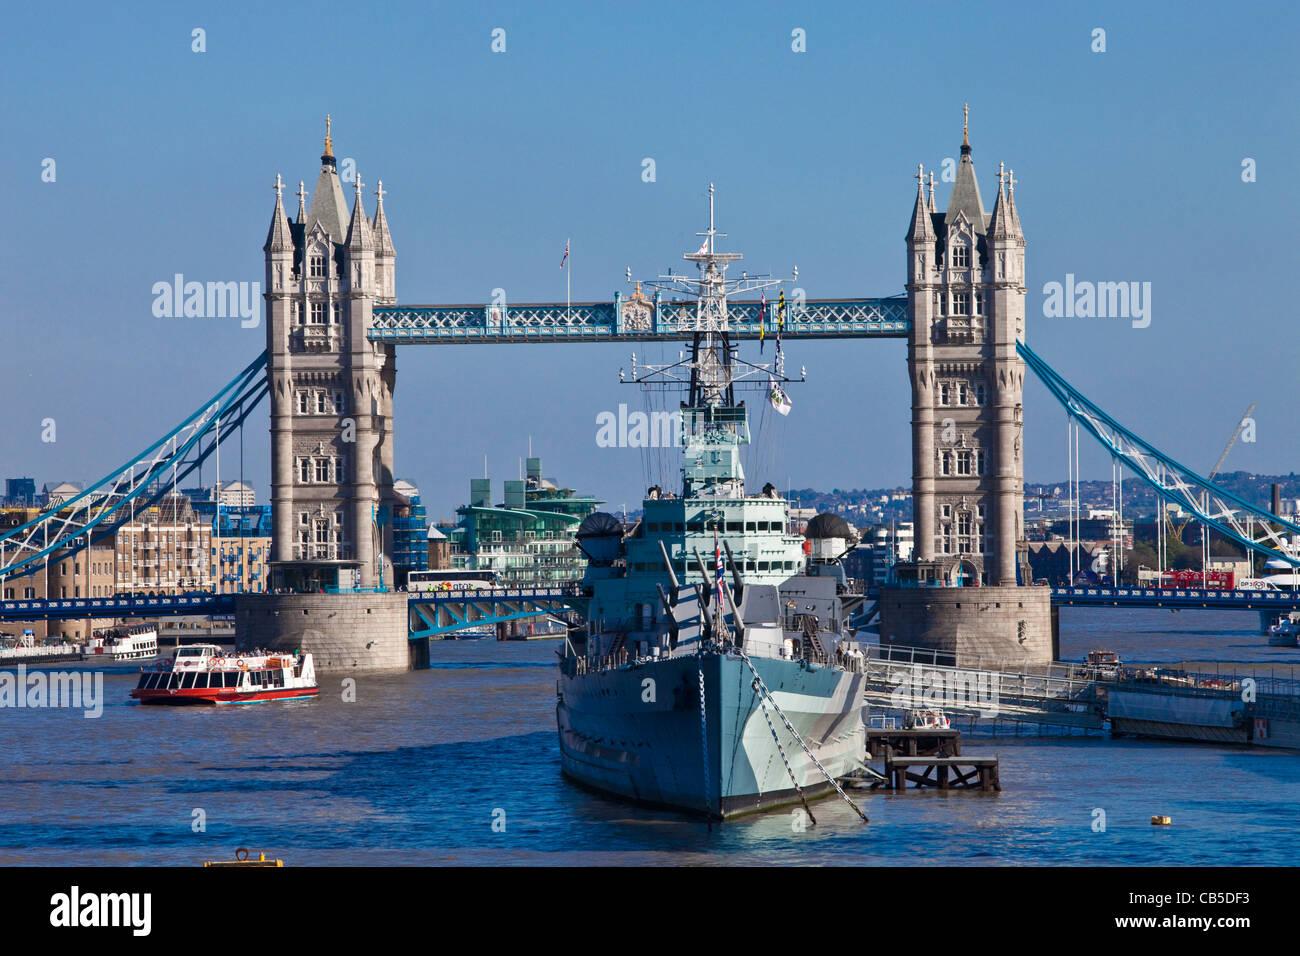 Tower Bridge and HMS Belfast, London, England - Stock Image